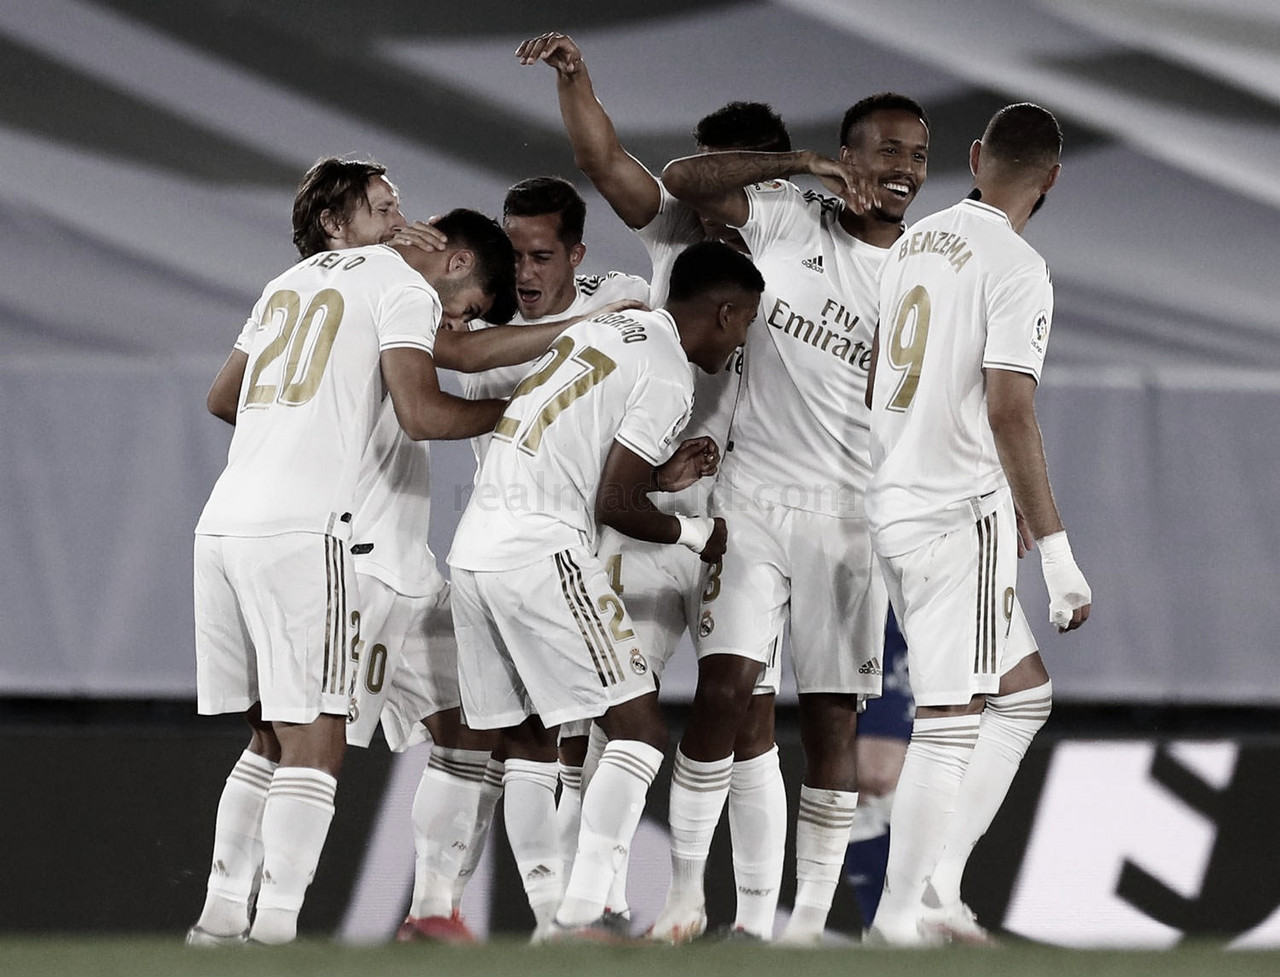 Racha de imbatibilidad del Real Madrid